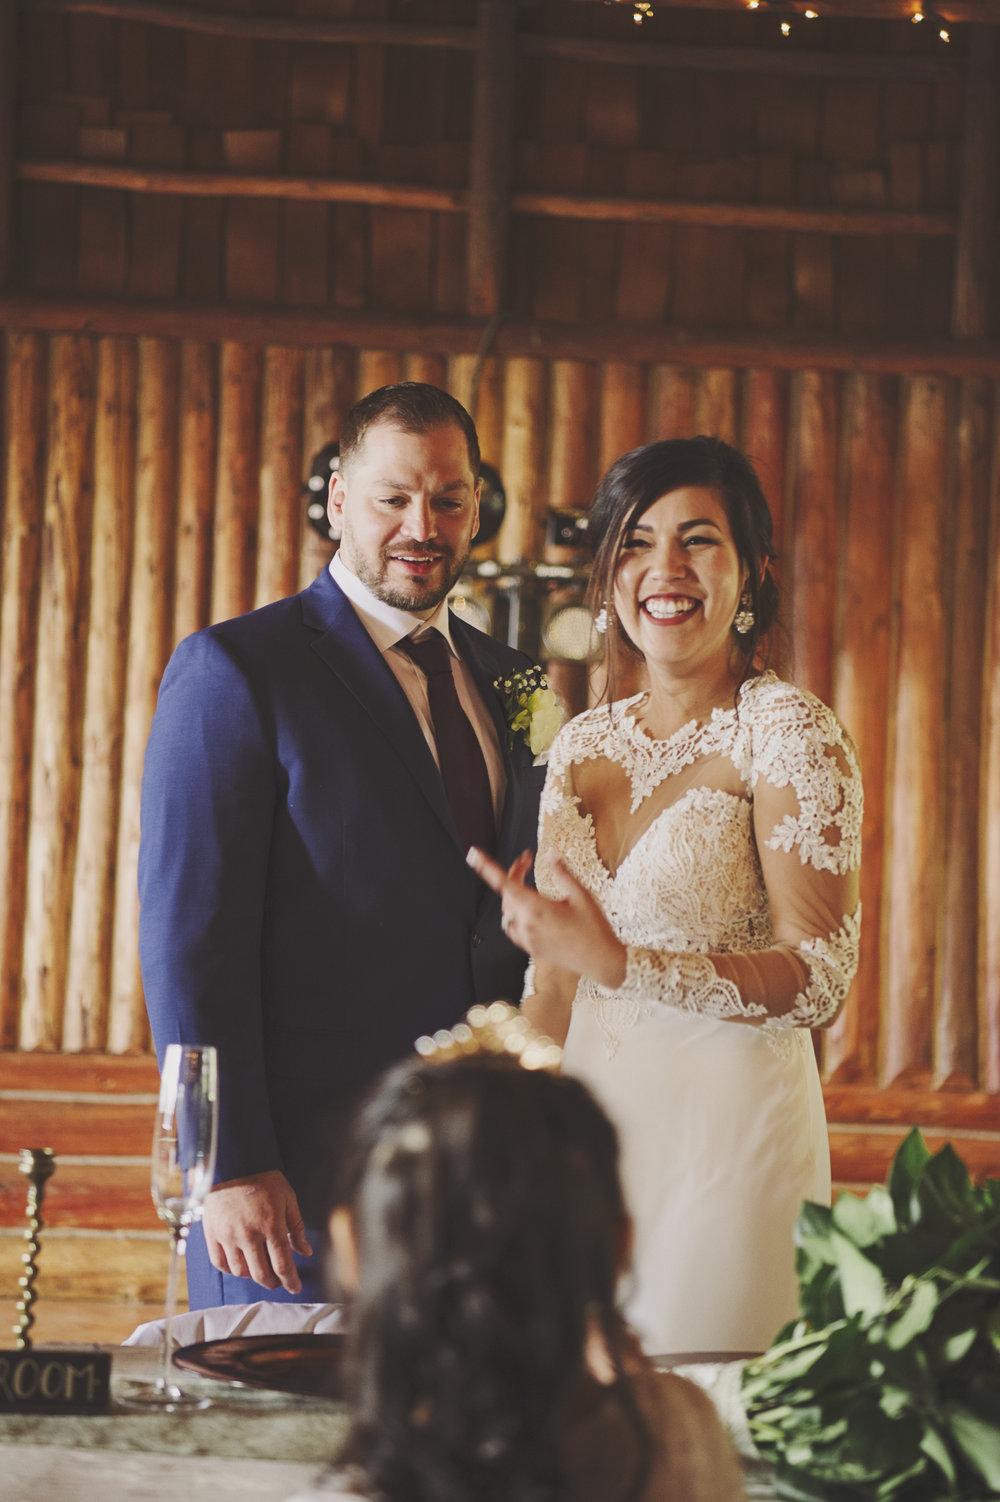 Woodsy Wedding_Kitsap Memorial State Park Wedding_Kelsey Lane Photography_reception bride and groom